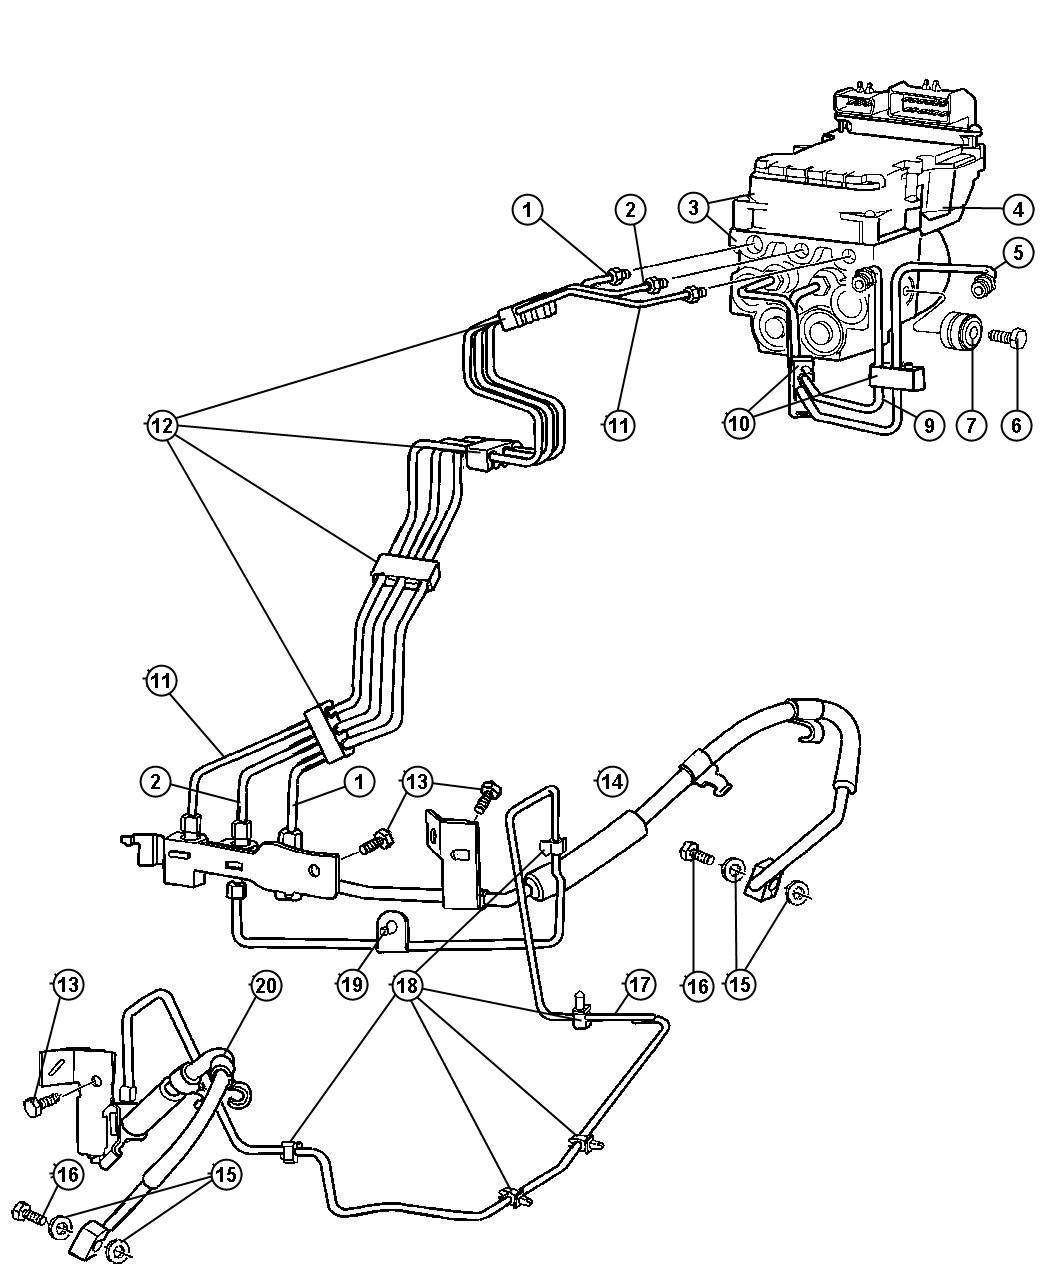 Dodge Ram 2500 Control unit. Anti-lock brake. [engines